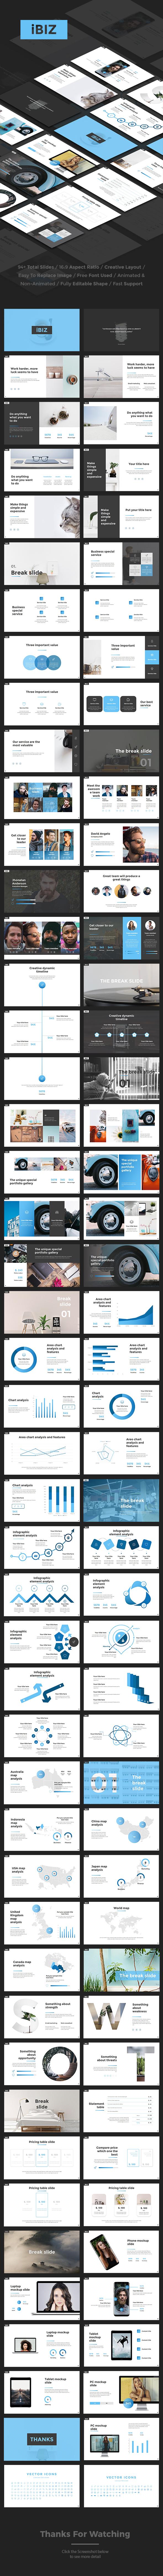 iBiz - Business Powerpoint Template - Business PowerPoint Templates